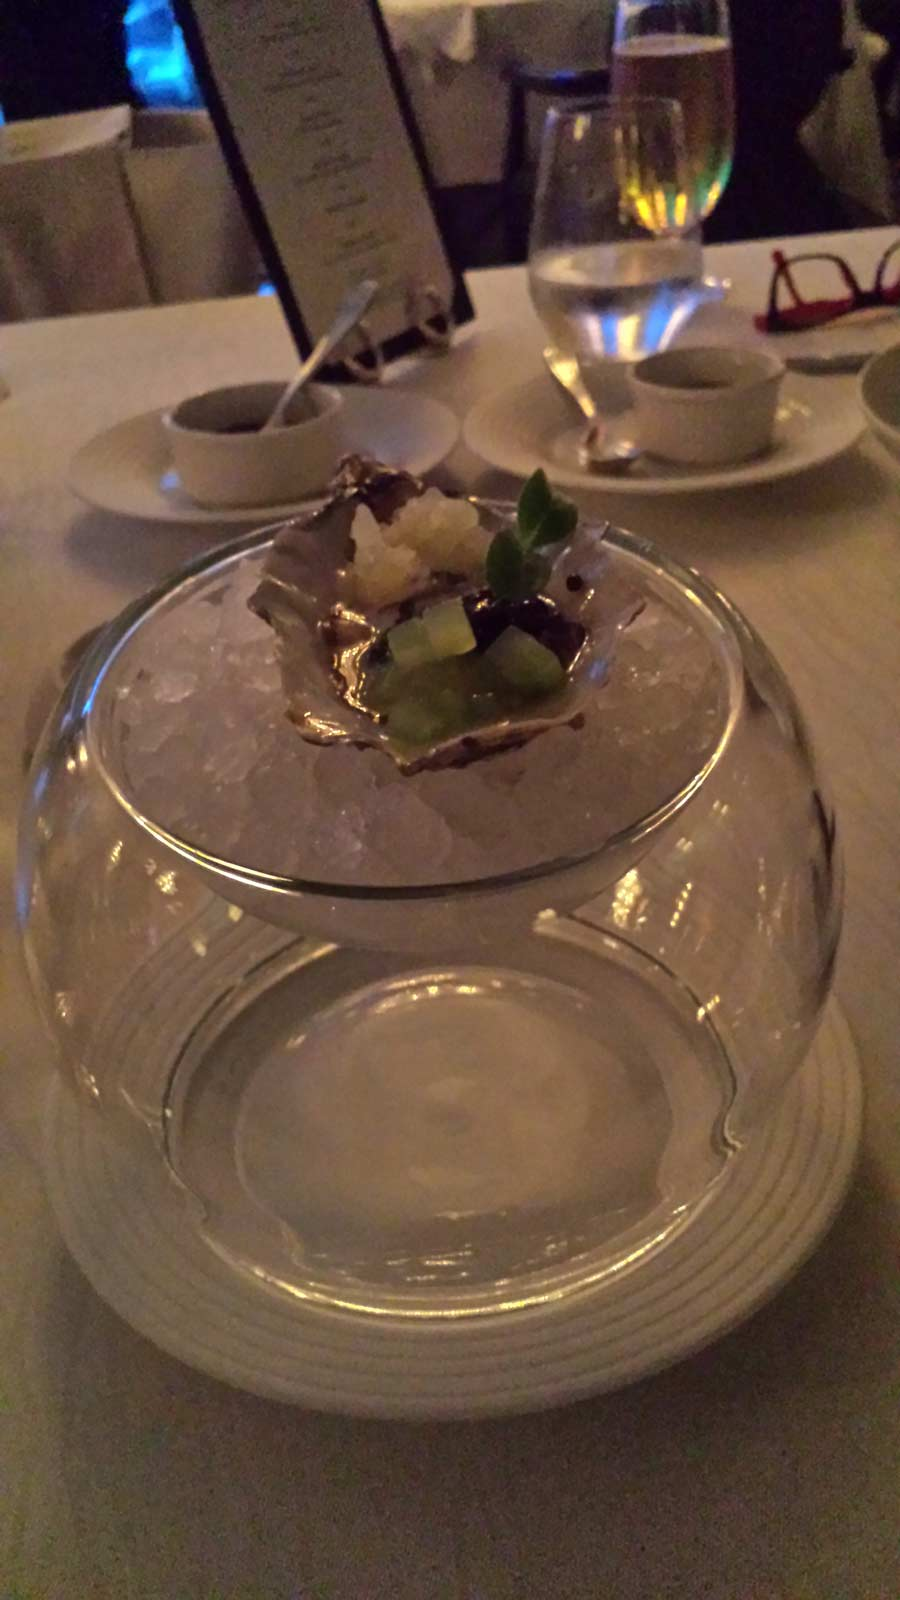 Muirgen-oyster-with-sturia-caviar